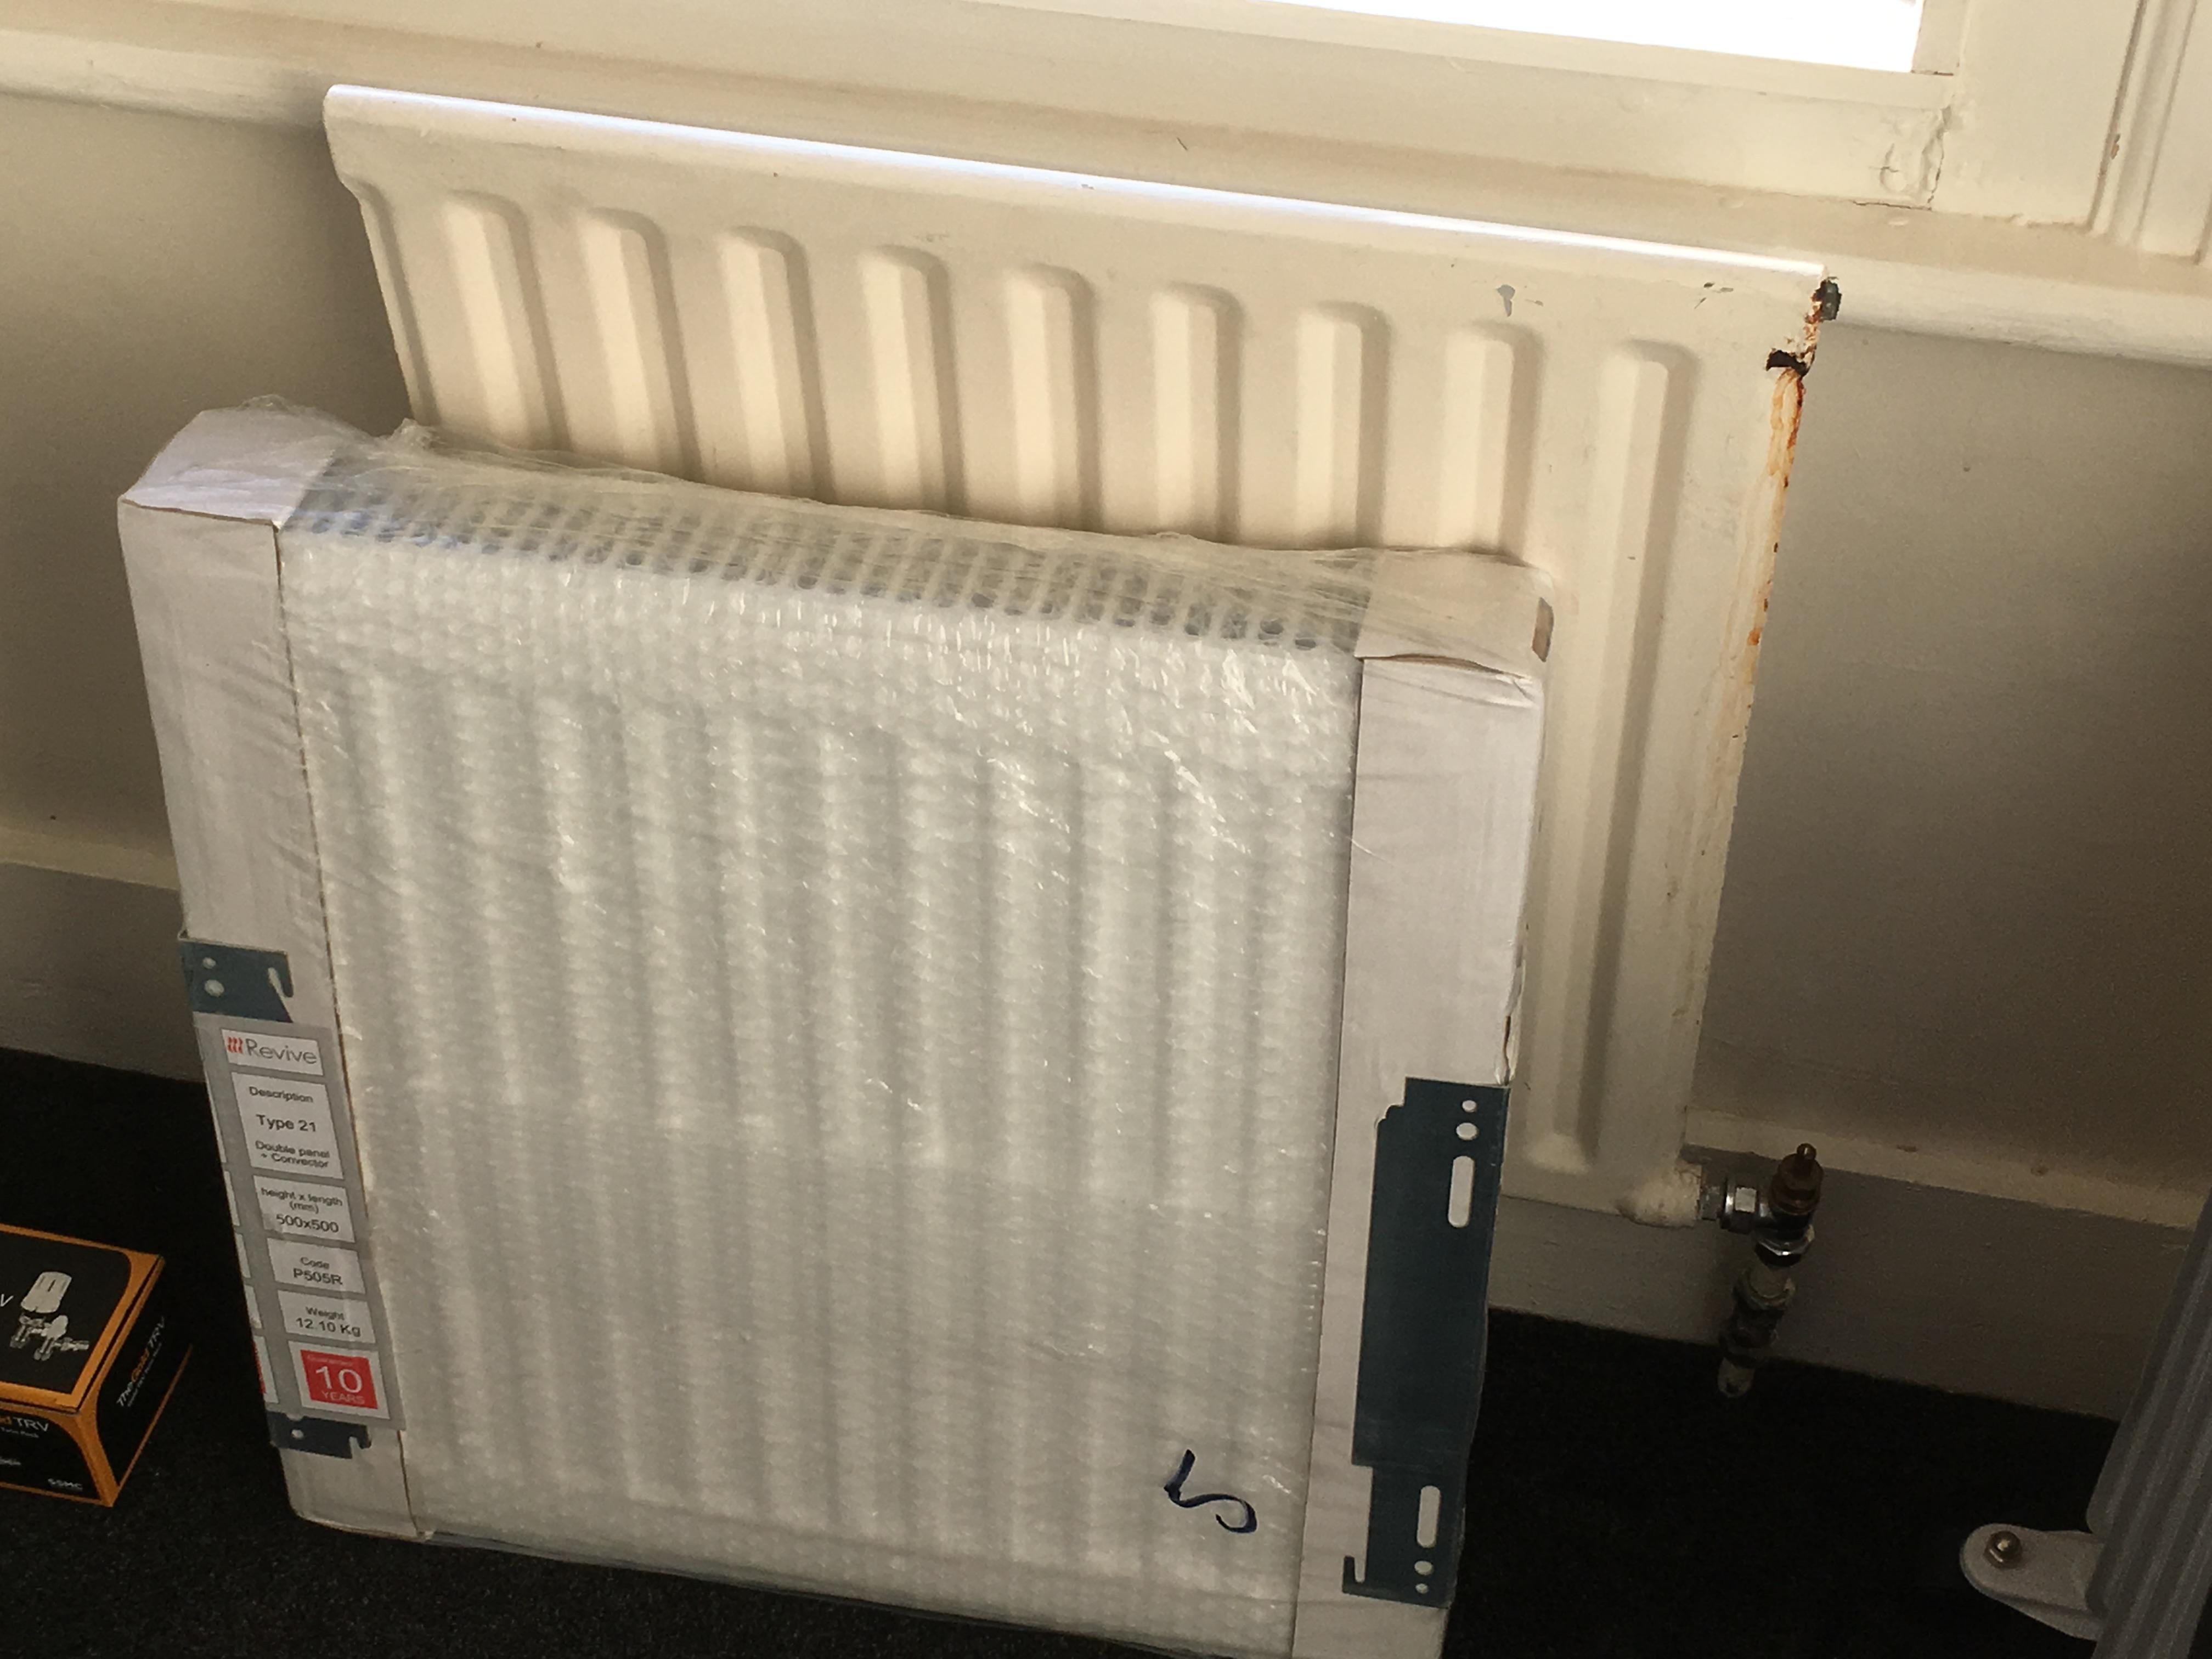 radiator installation twickenham 5 switchmaster sm300 wiring diagram switchmaster 300 timer manual switchmaster sm805 wiring diagram at bayanpartner.co